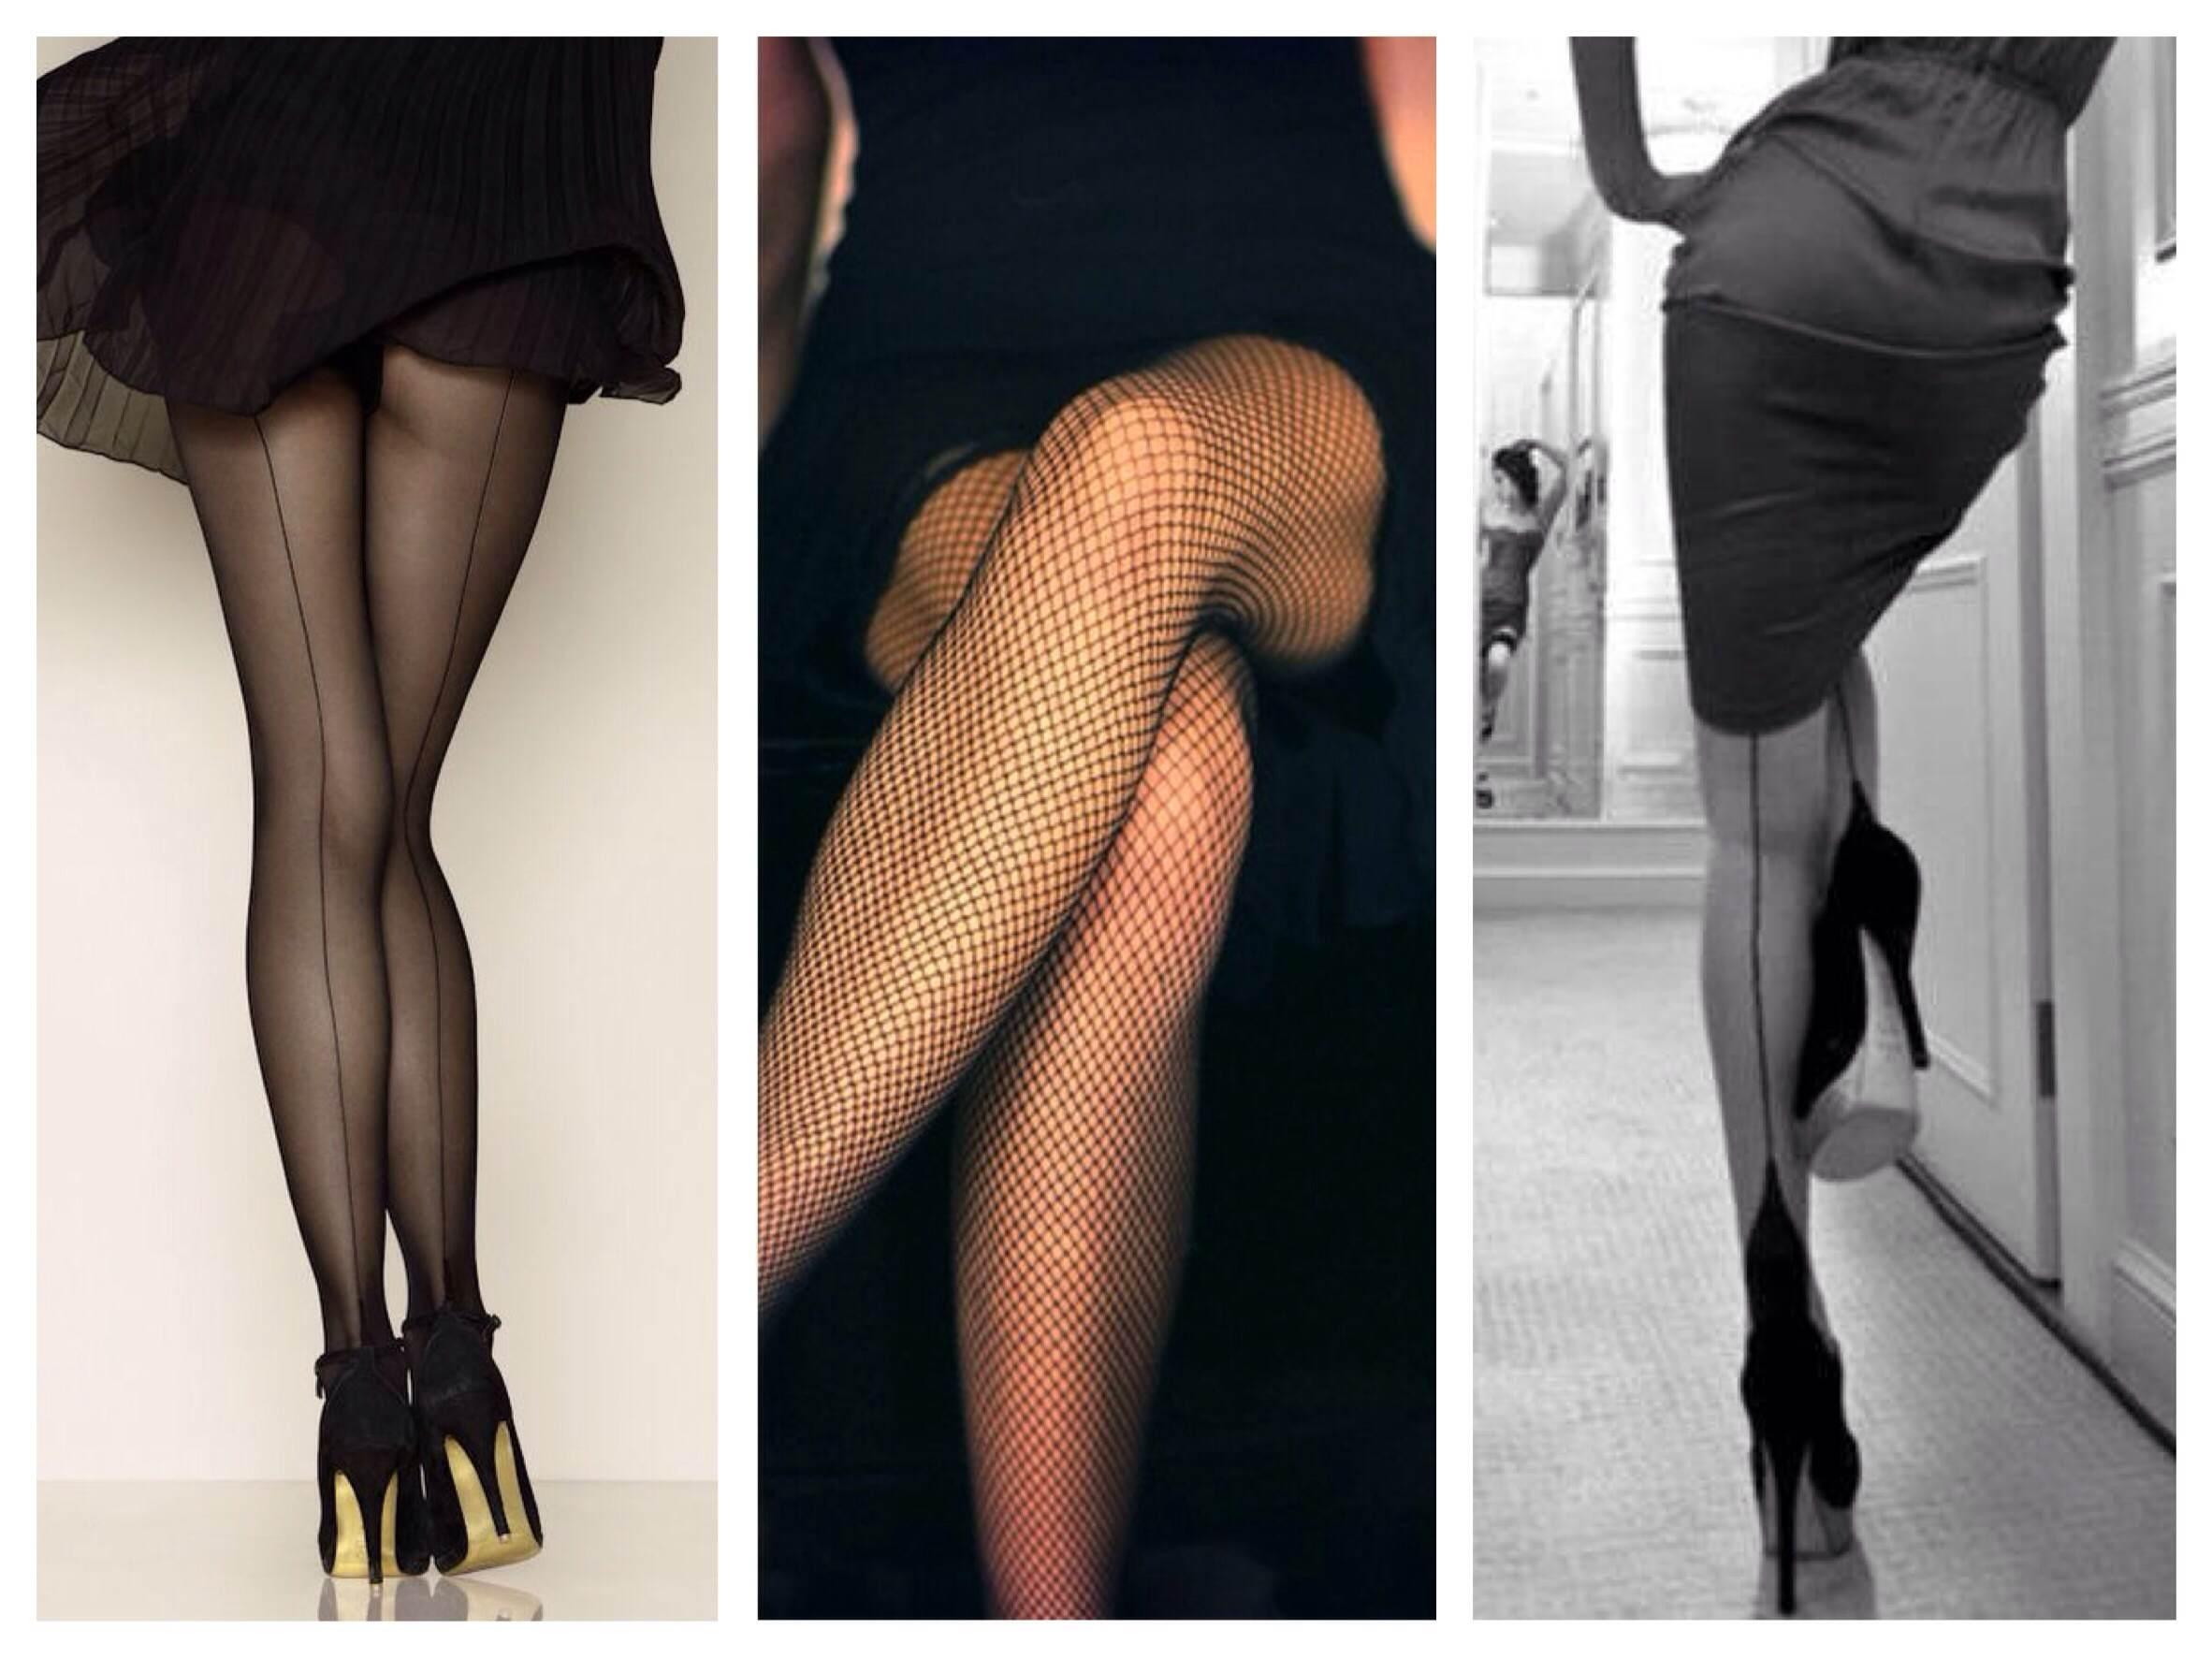 Женские ноги в колготках под юбкой фото — pic 9